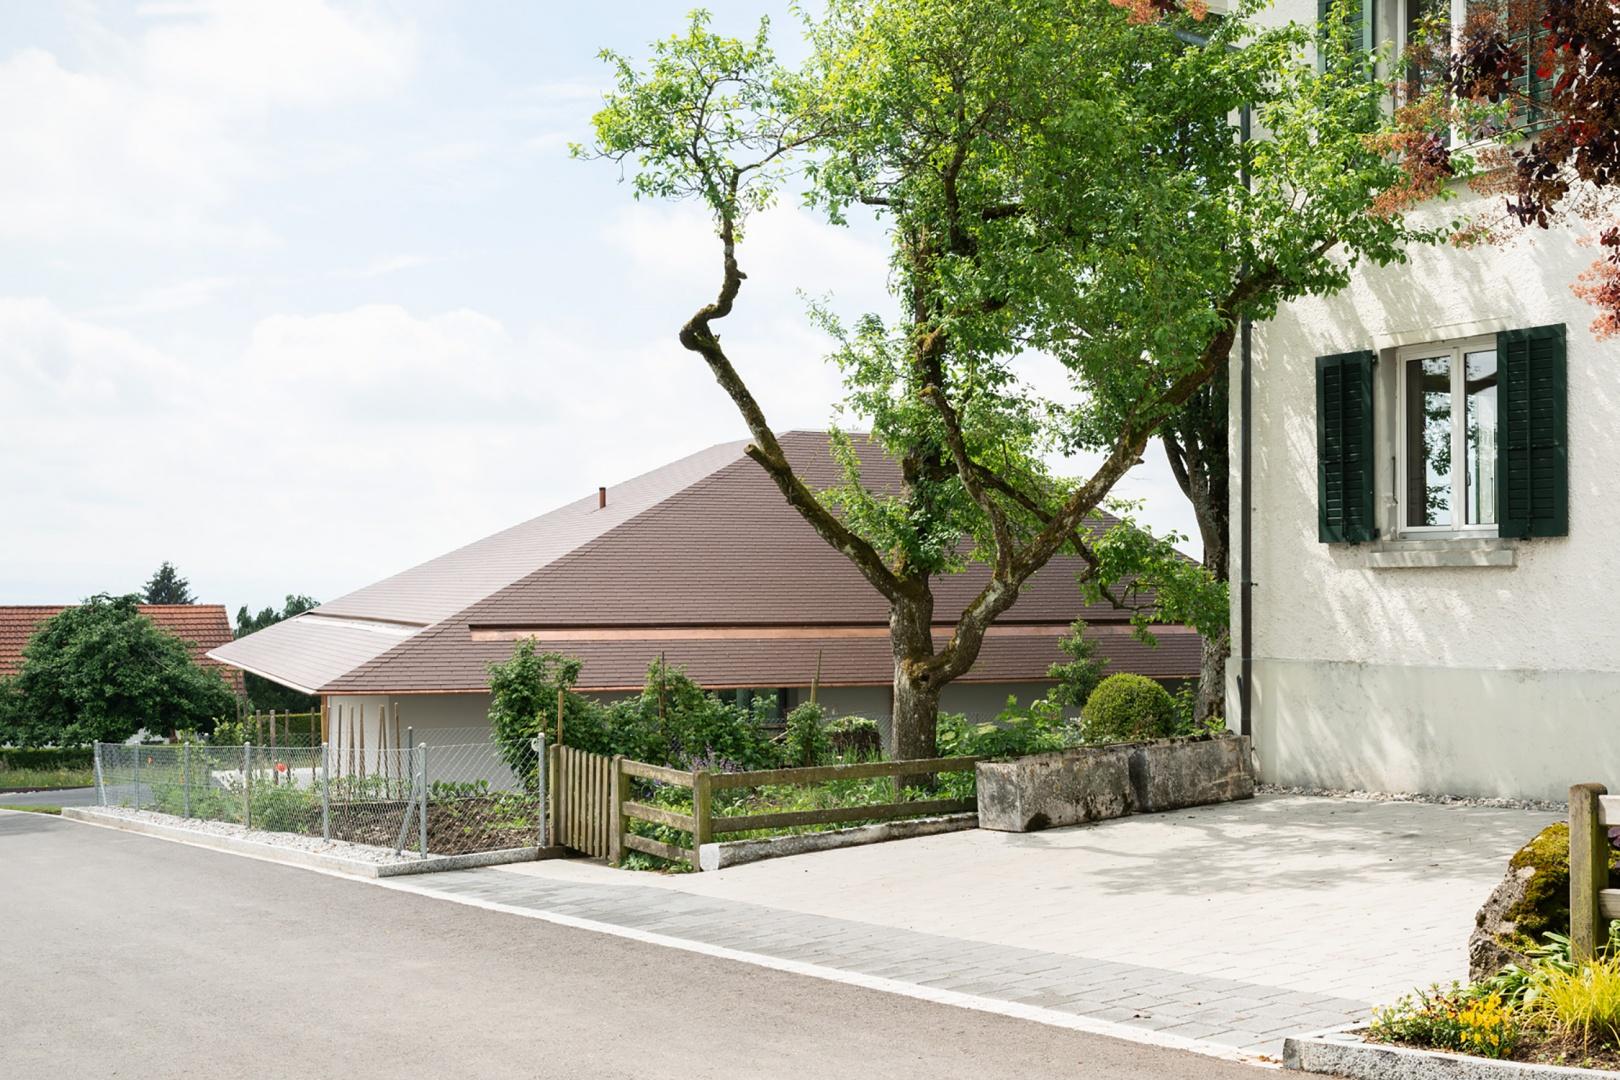 Nordfassade © HSB Architekten GmbH, Poststrasse 1, 4500 Solothurn